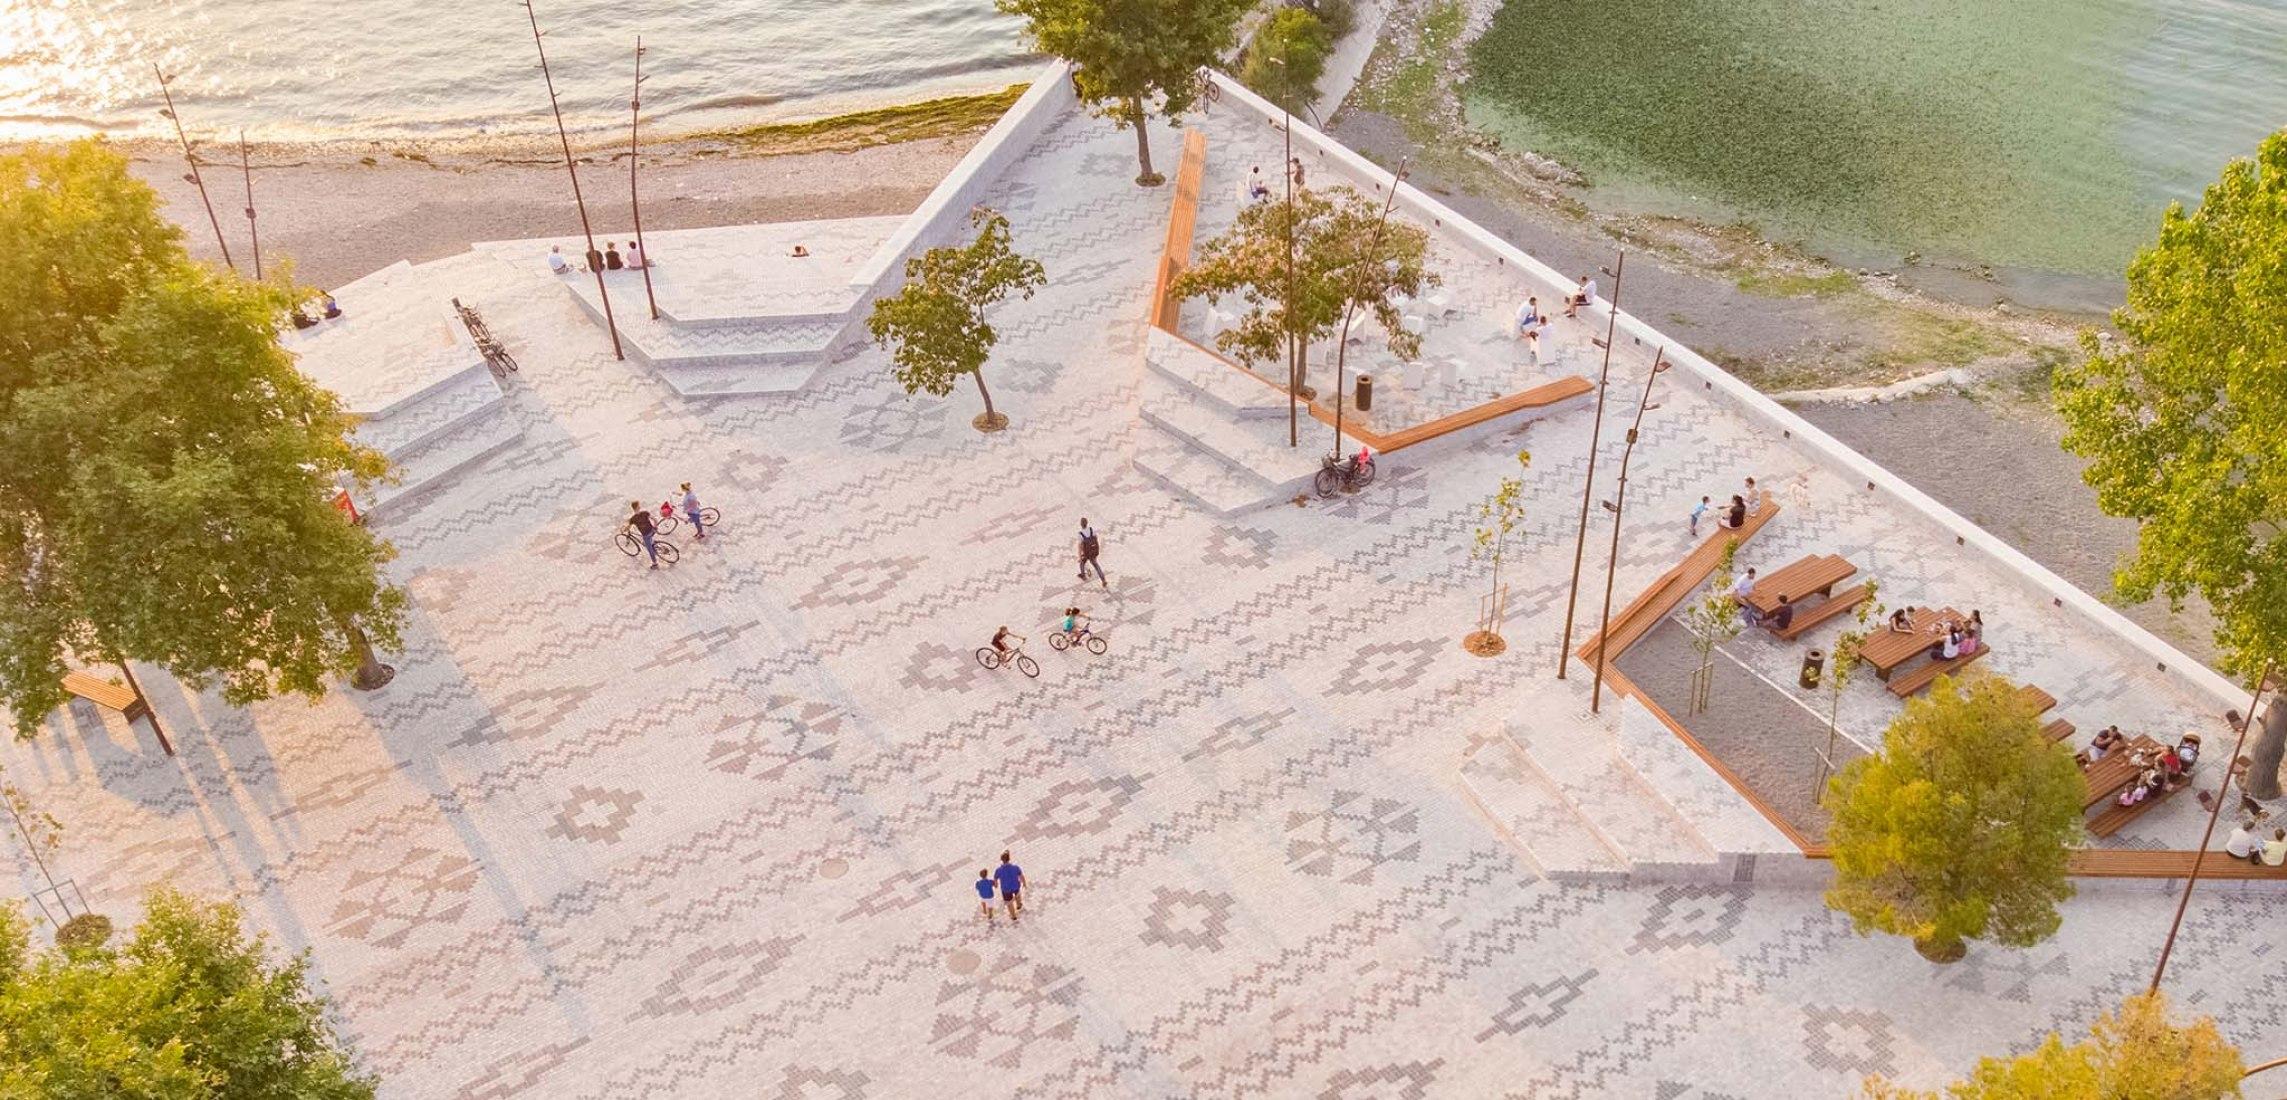 Albanian Carpet por Casanova + Hernandez Architects. Fotografía por E. Zhabjaku